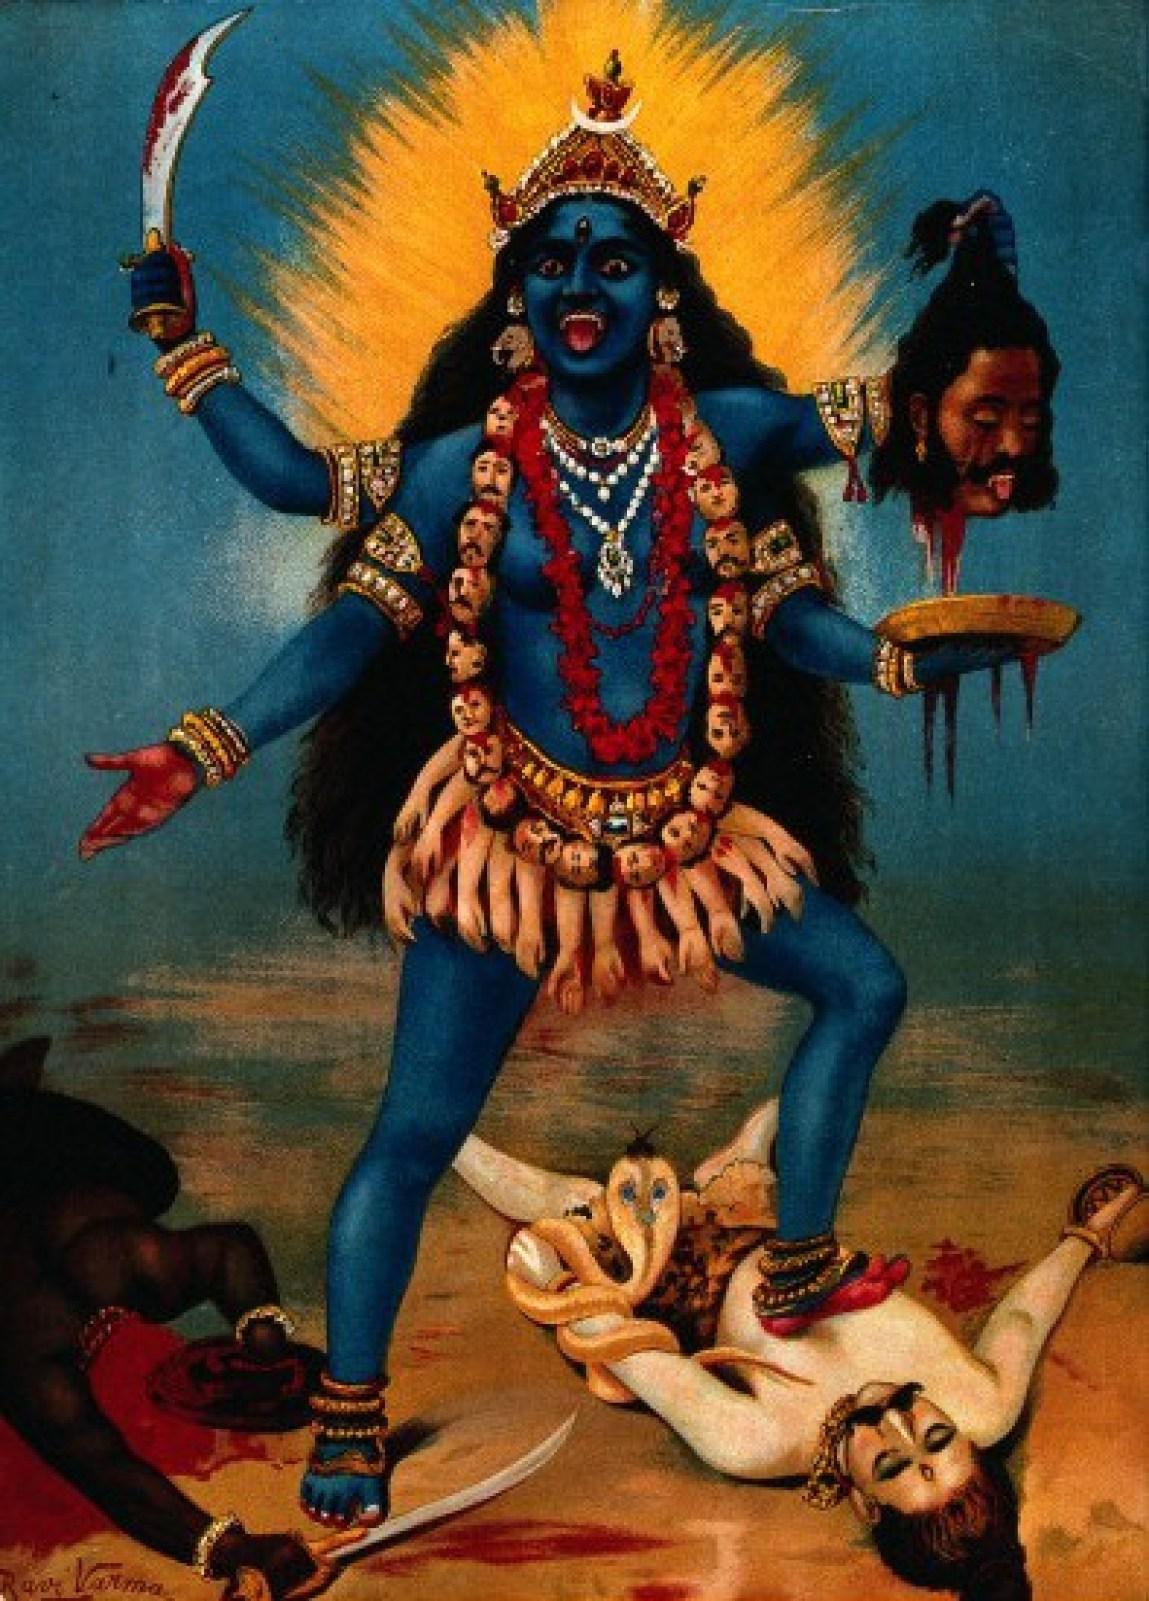 V0045118 Kali trampling Shiva. Chromolithograph by R. Varma.